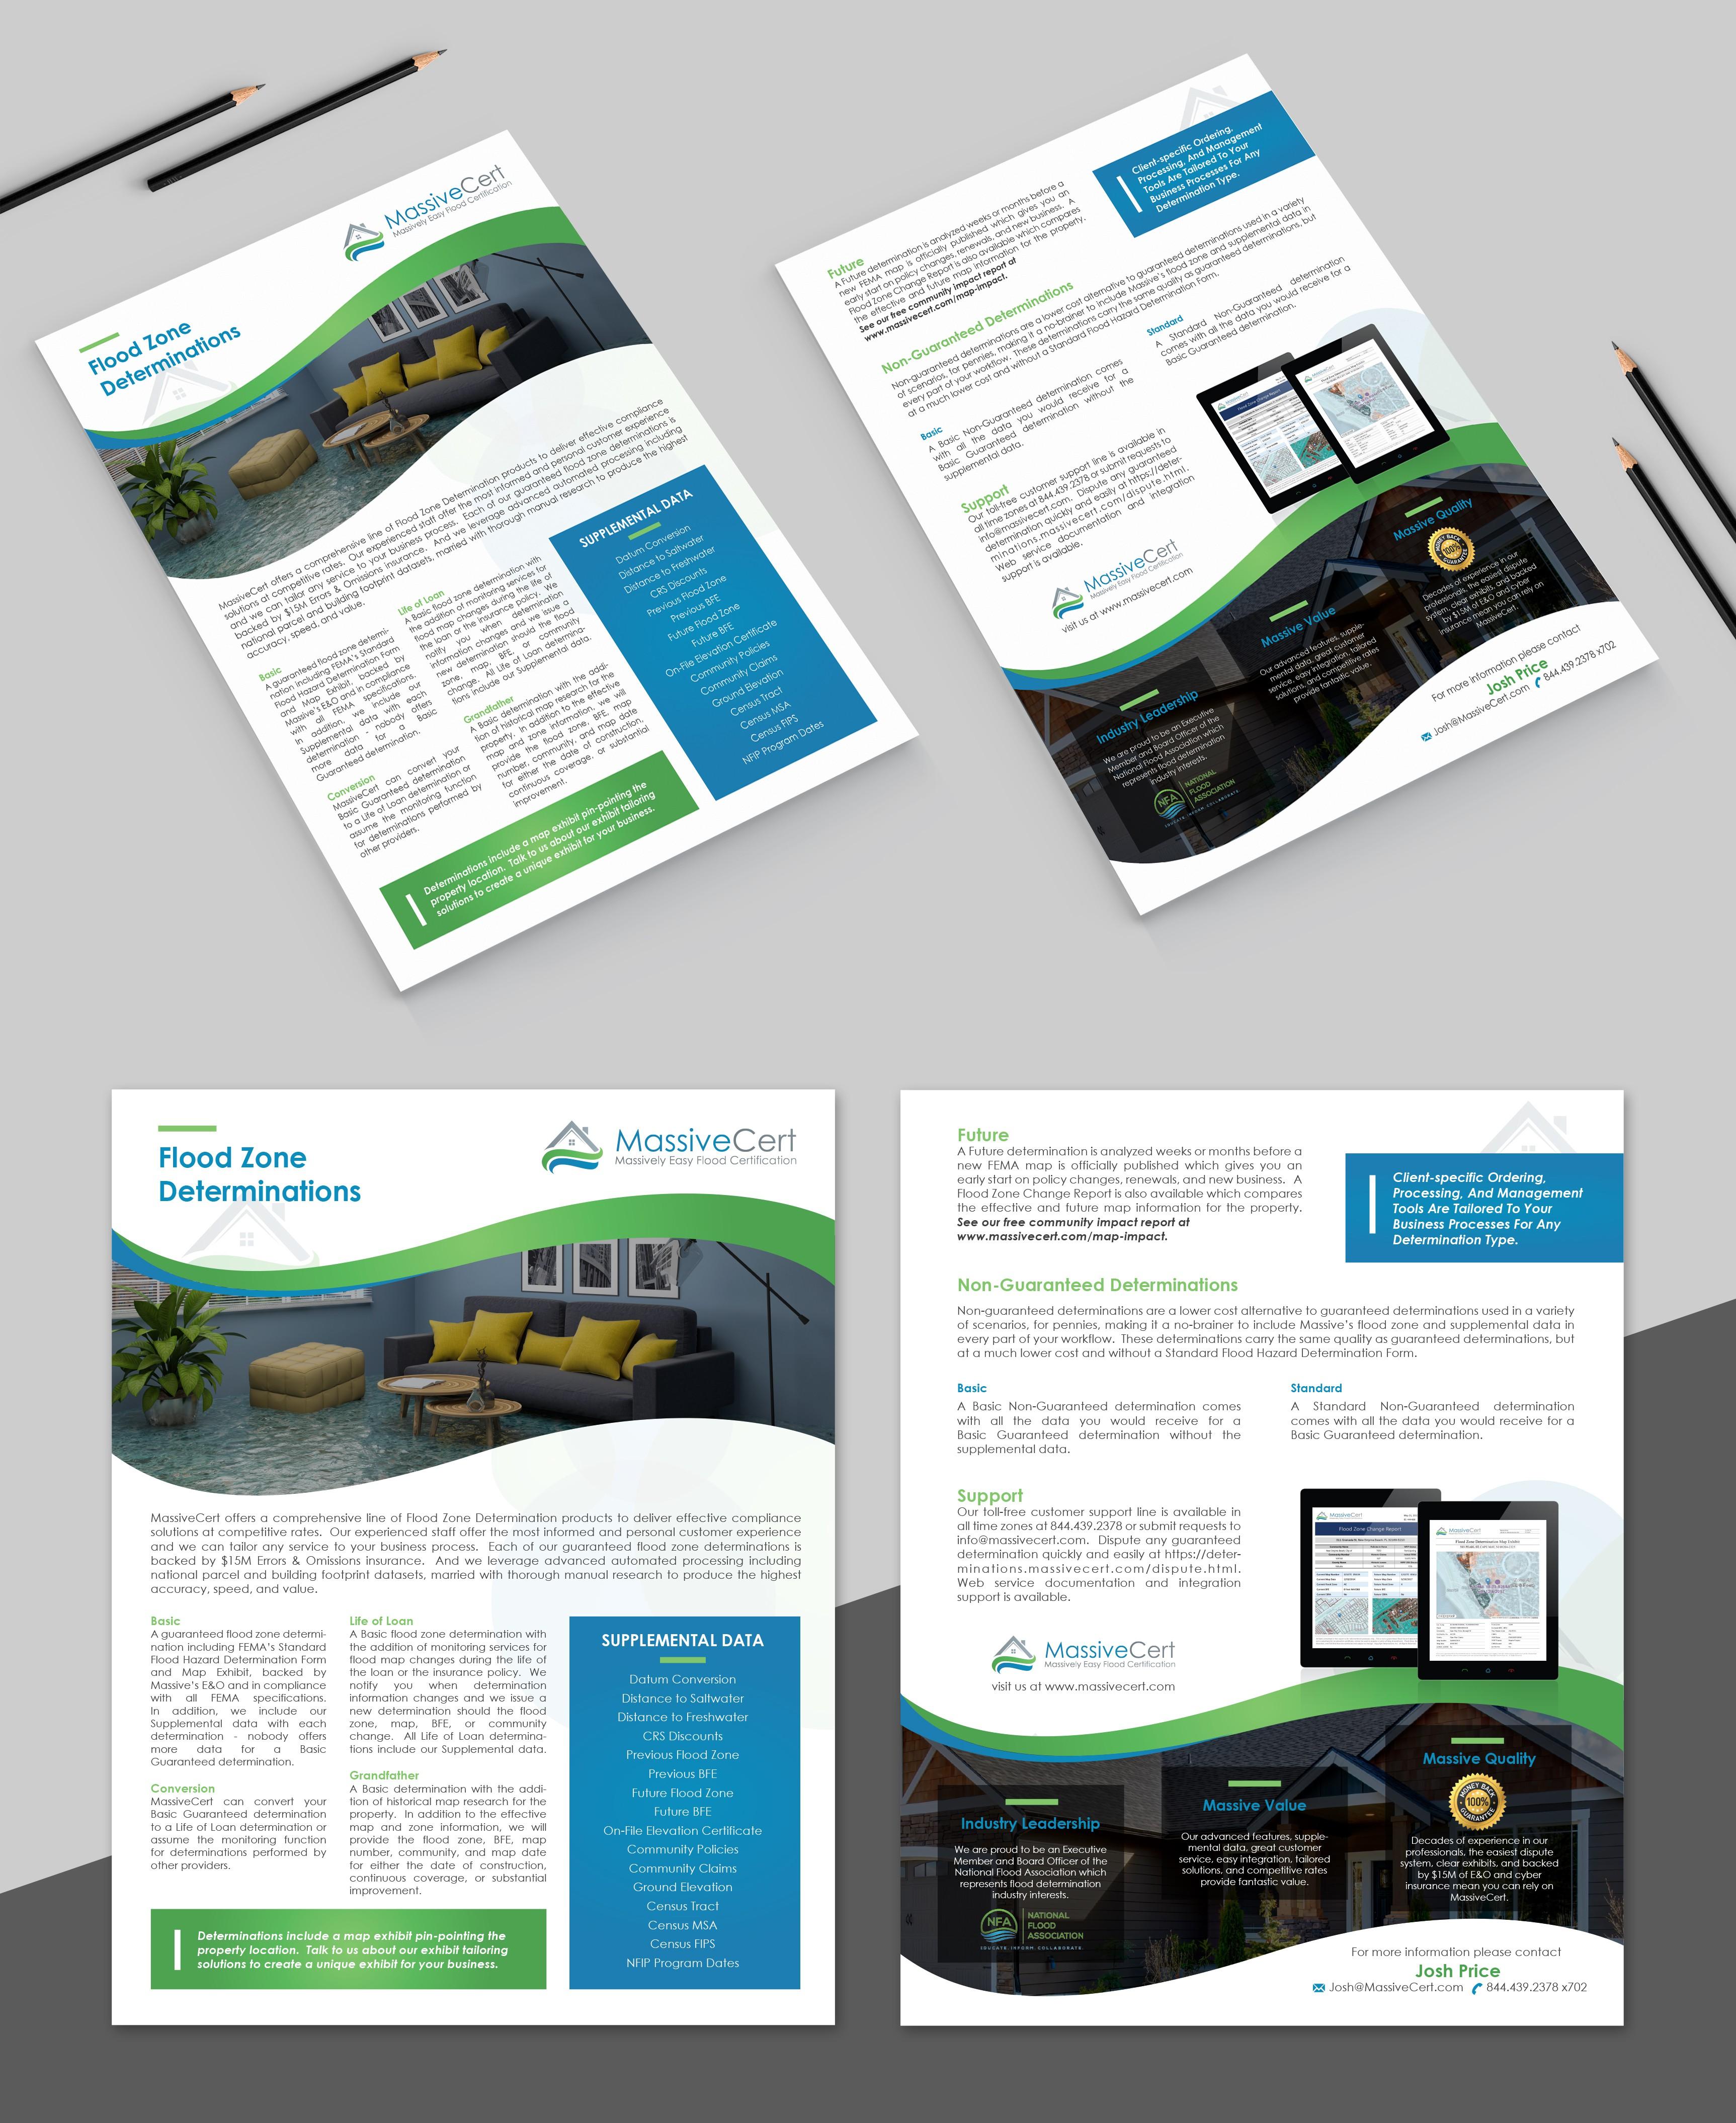 Start-up Flood Certification company needs brochure identity help